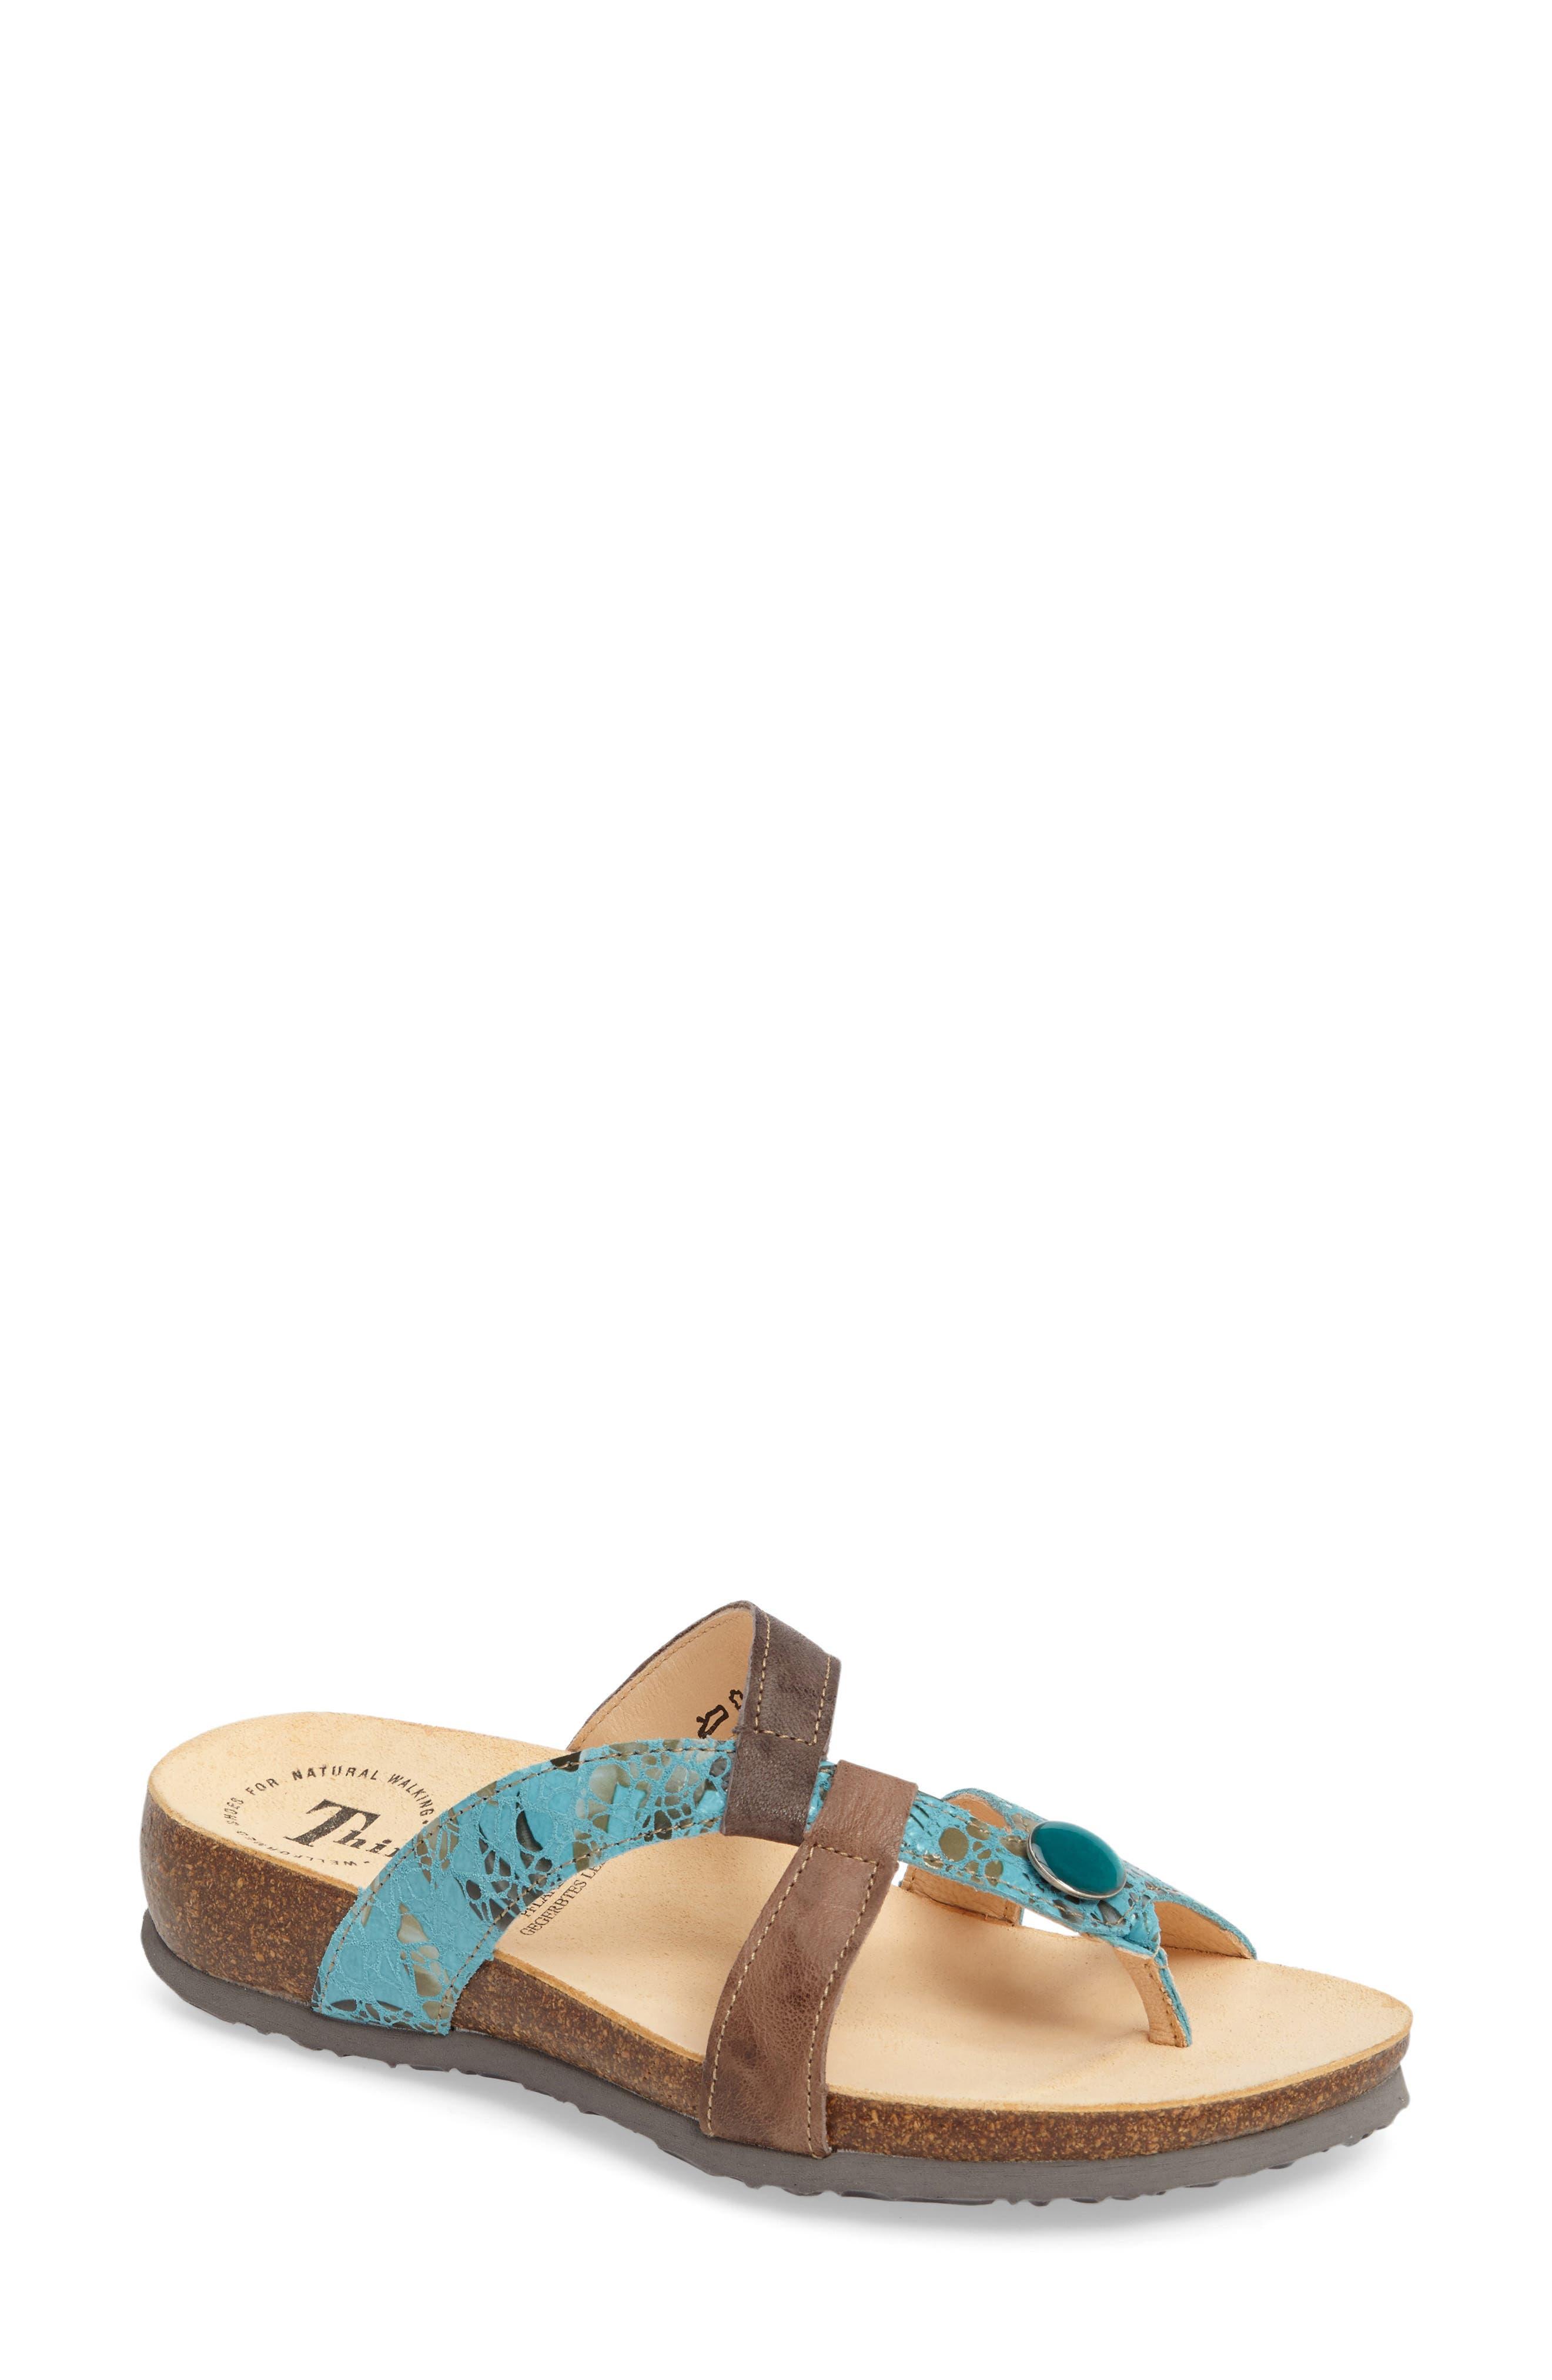 Alternate Image 1 Selected - Think! 'Julia Strappy' Sandal